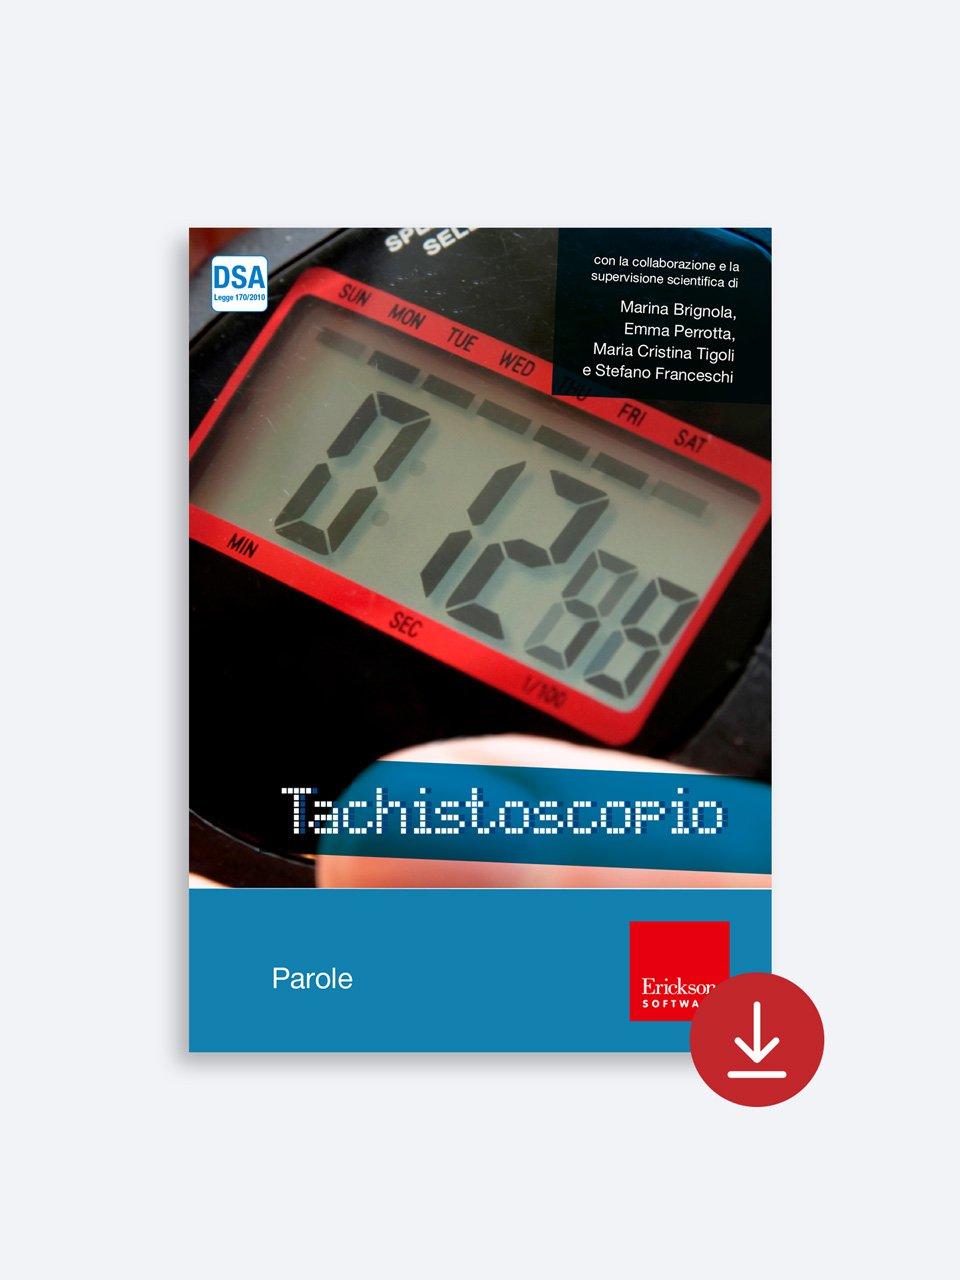 Tachistoscopio SUITE - App e software - Erickson 5